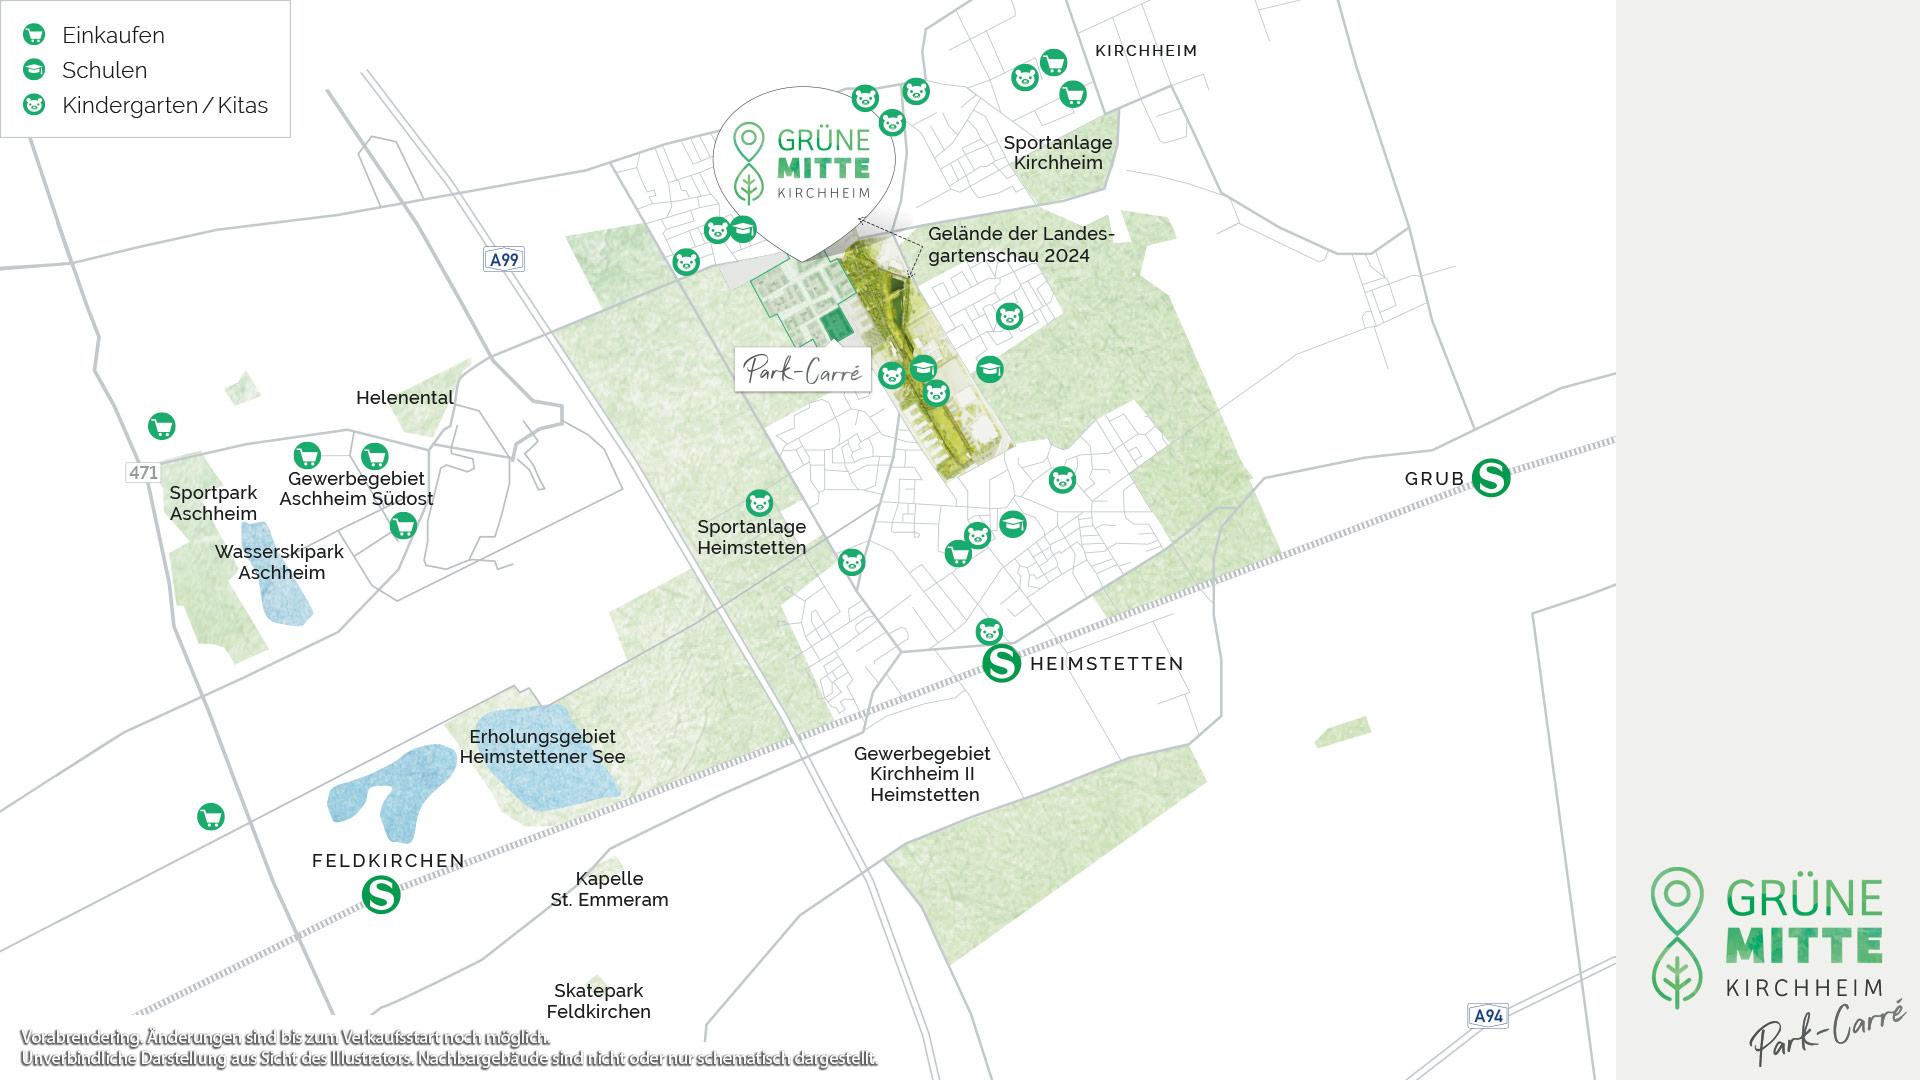 Immobilie Grüne Mitte Kirchheim - Park-Carré - Vorankündigung - Projektübersichtsplan